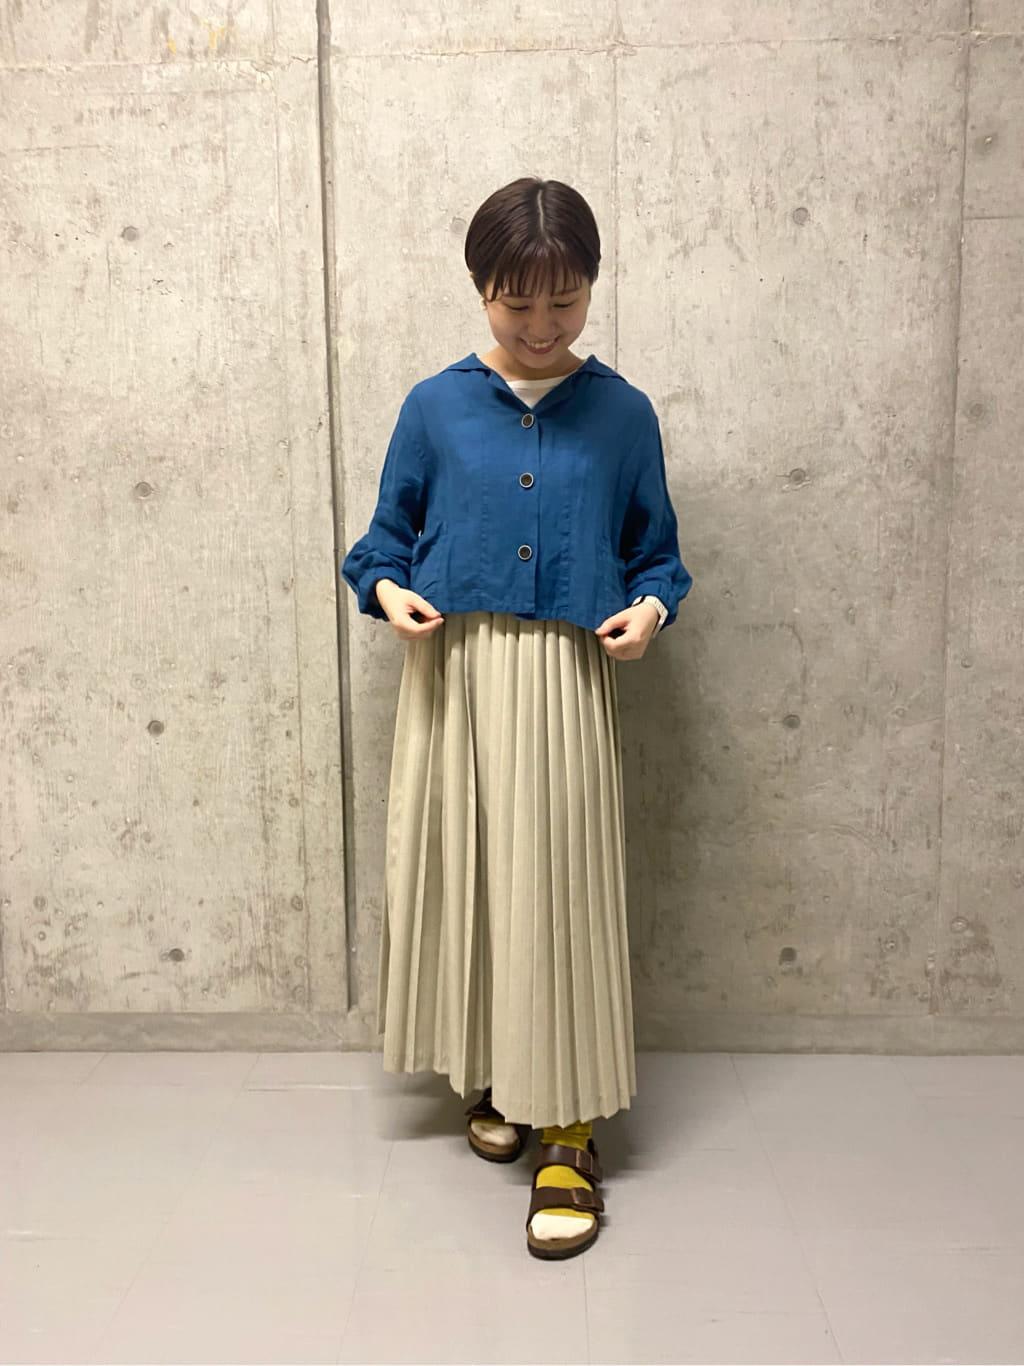 bulle de savon 阪急西宮ガーデンズ 身長:149cm 2021.07.14